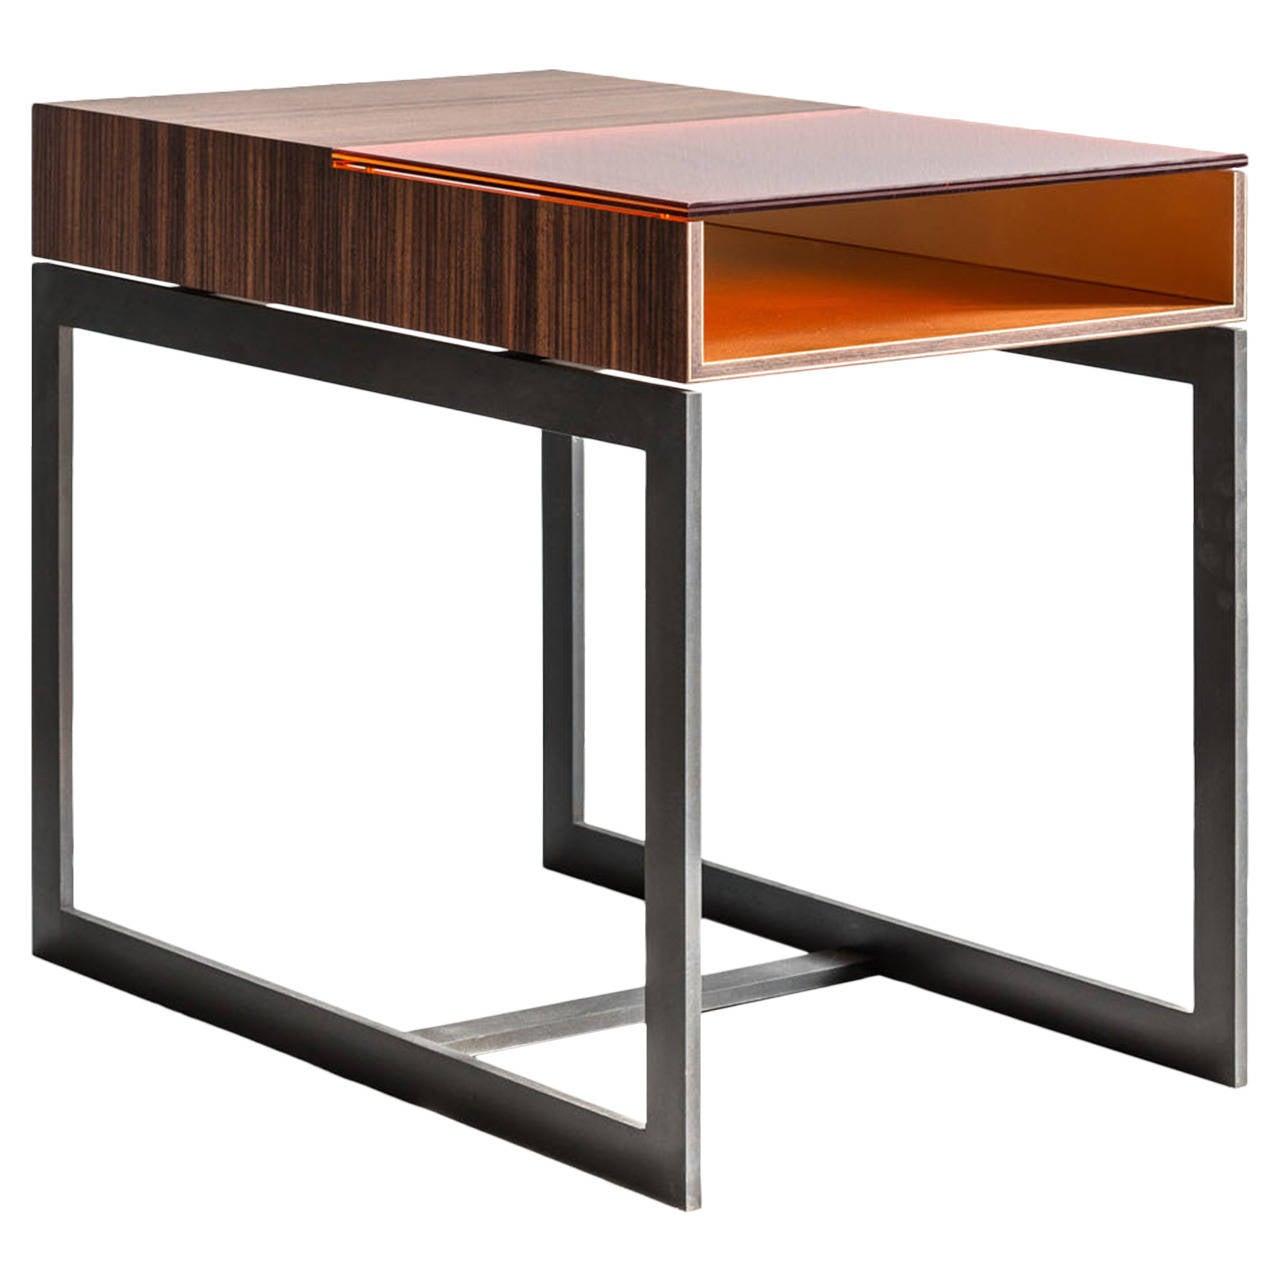 Booker Side Table in Santos Veneer, Colored Glass, Bronze Interior, Steel Base For Sale